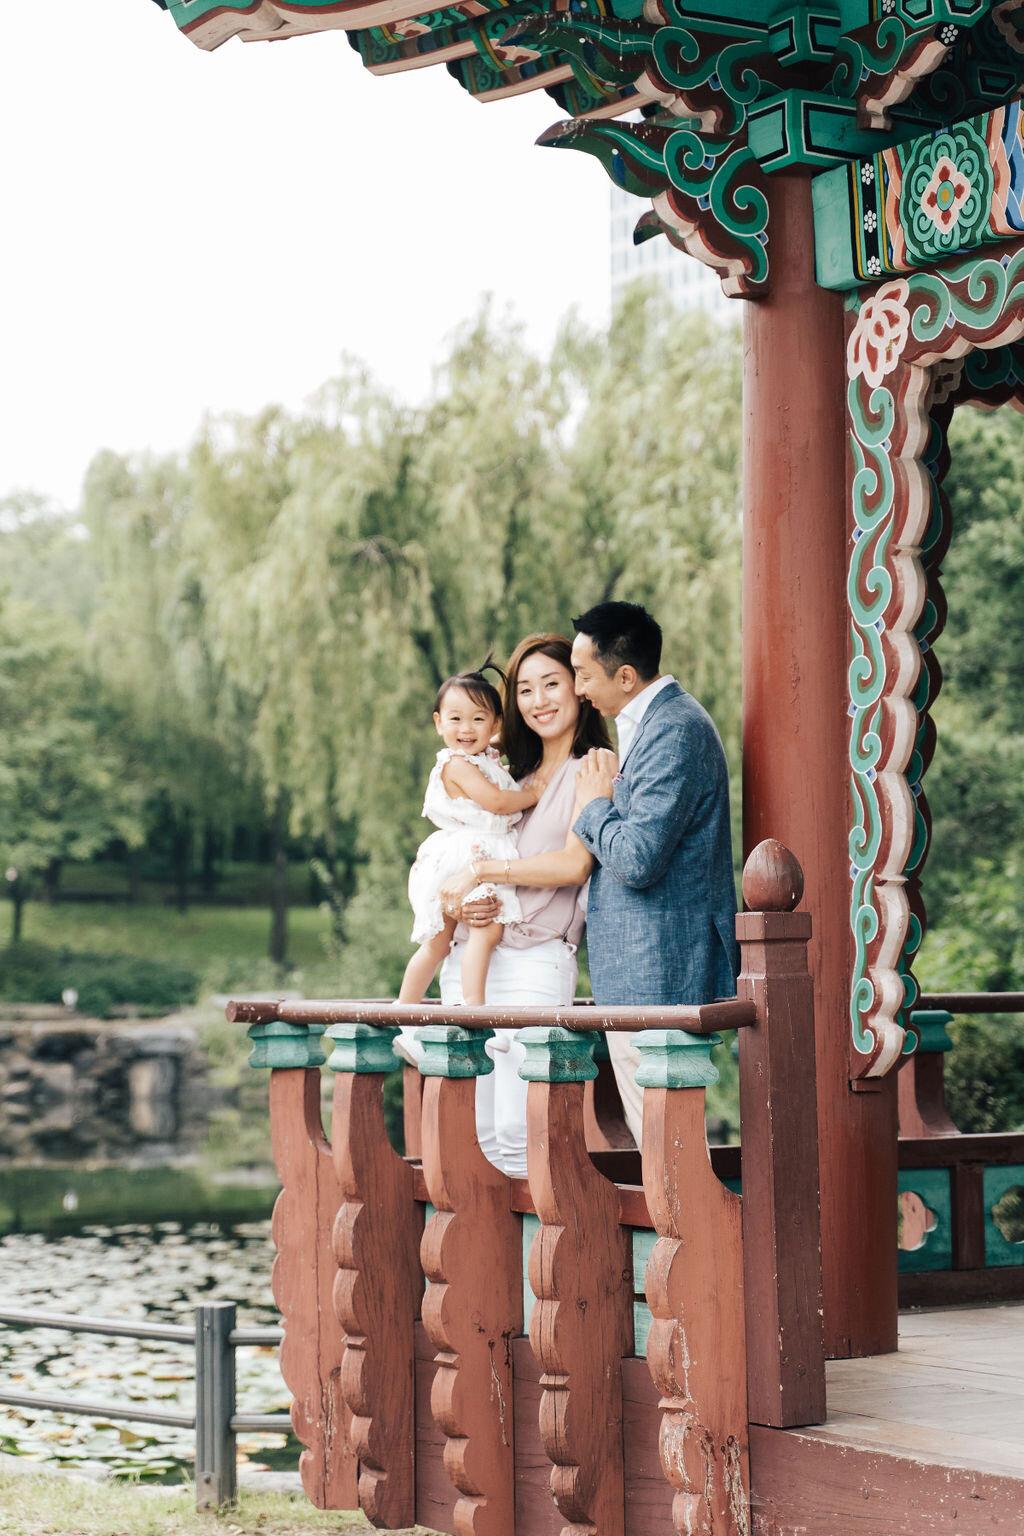 Seoul South Korea Family Photographer 08